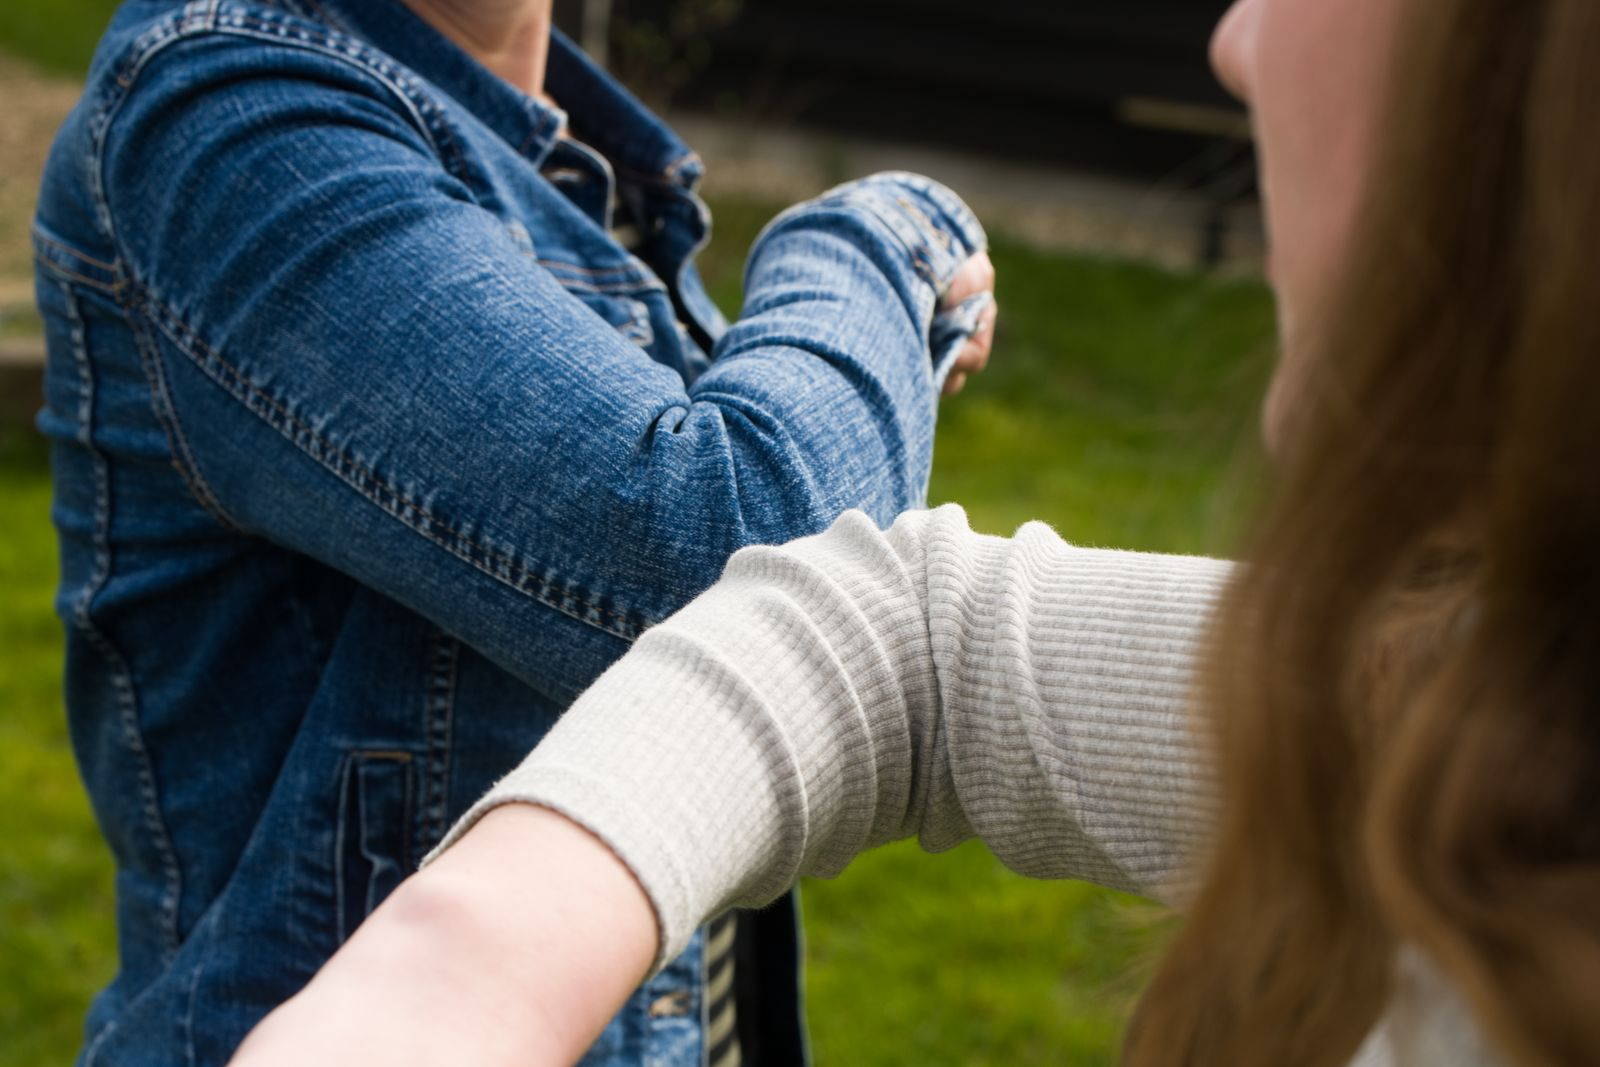 Alternative handshake. Bumping elbow to say hello. Corona Covid-19 meeting.